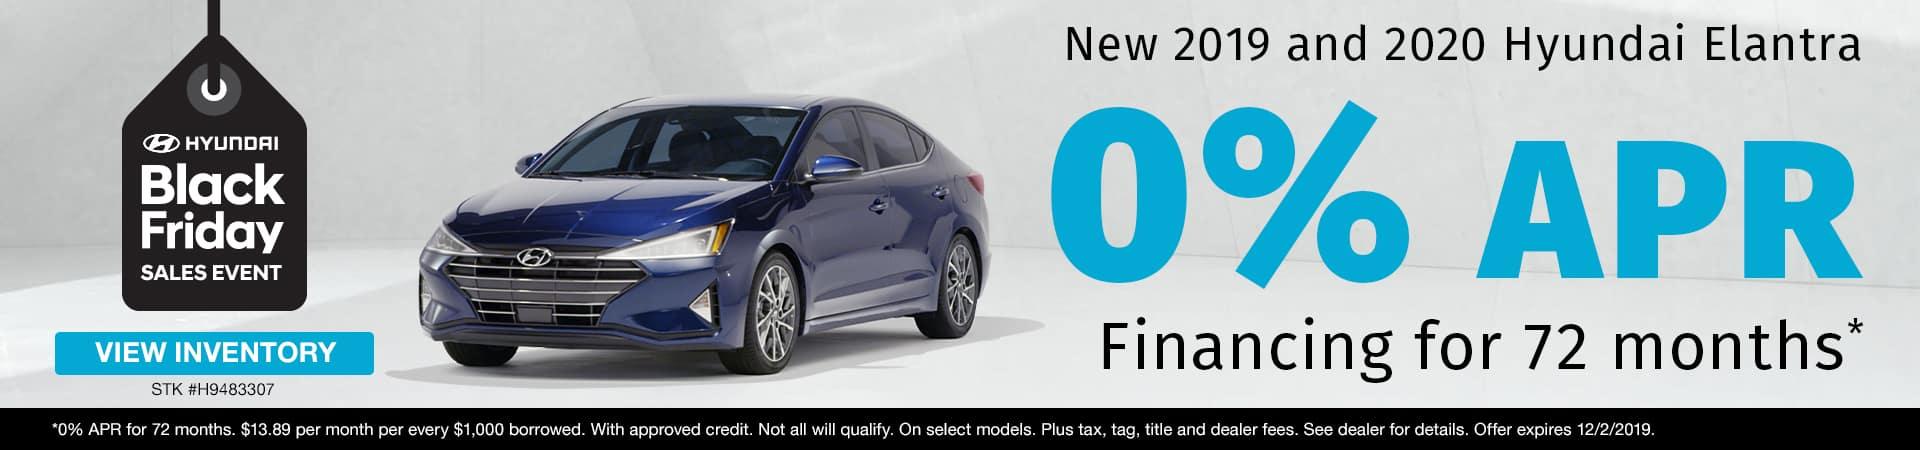 Get 0% APR Financing on new 2019 or 2020 Hyundai Elantra models in Murfreesboro TN